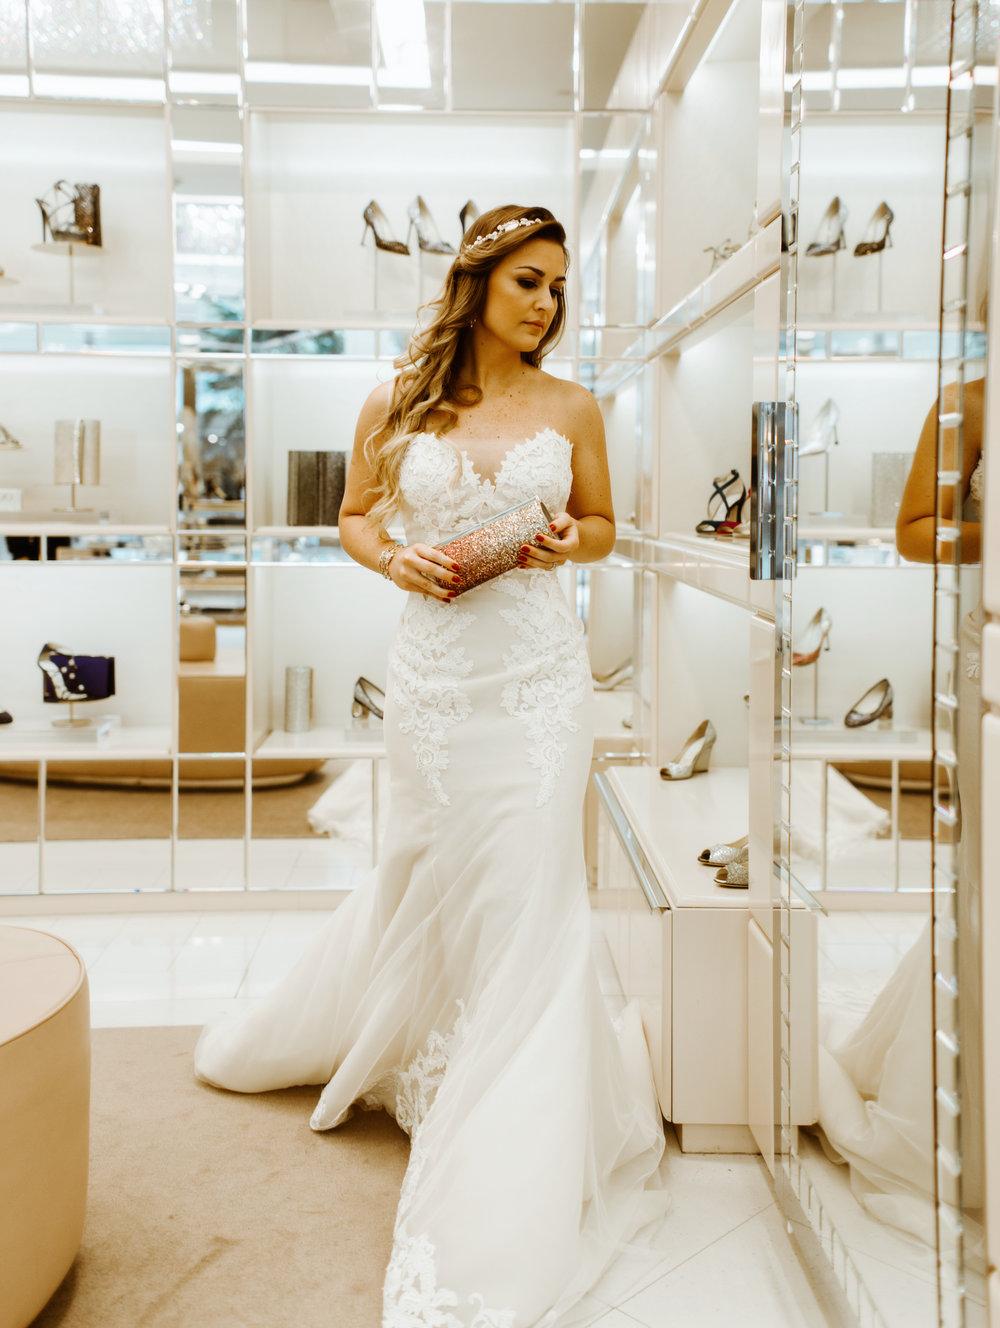 Solutions Bridal | Marisa Bridals | Vanessa Boy |Vanessaboy.com | orlando,fl-628.com |final.jpg